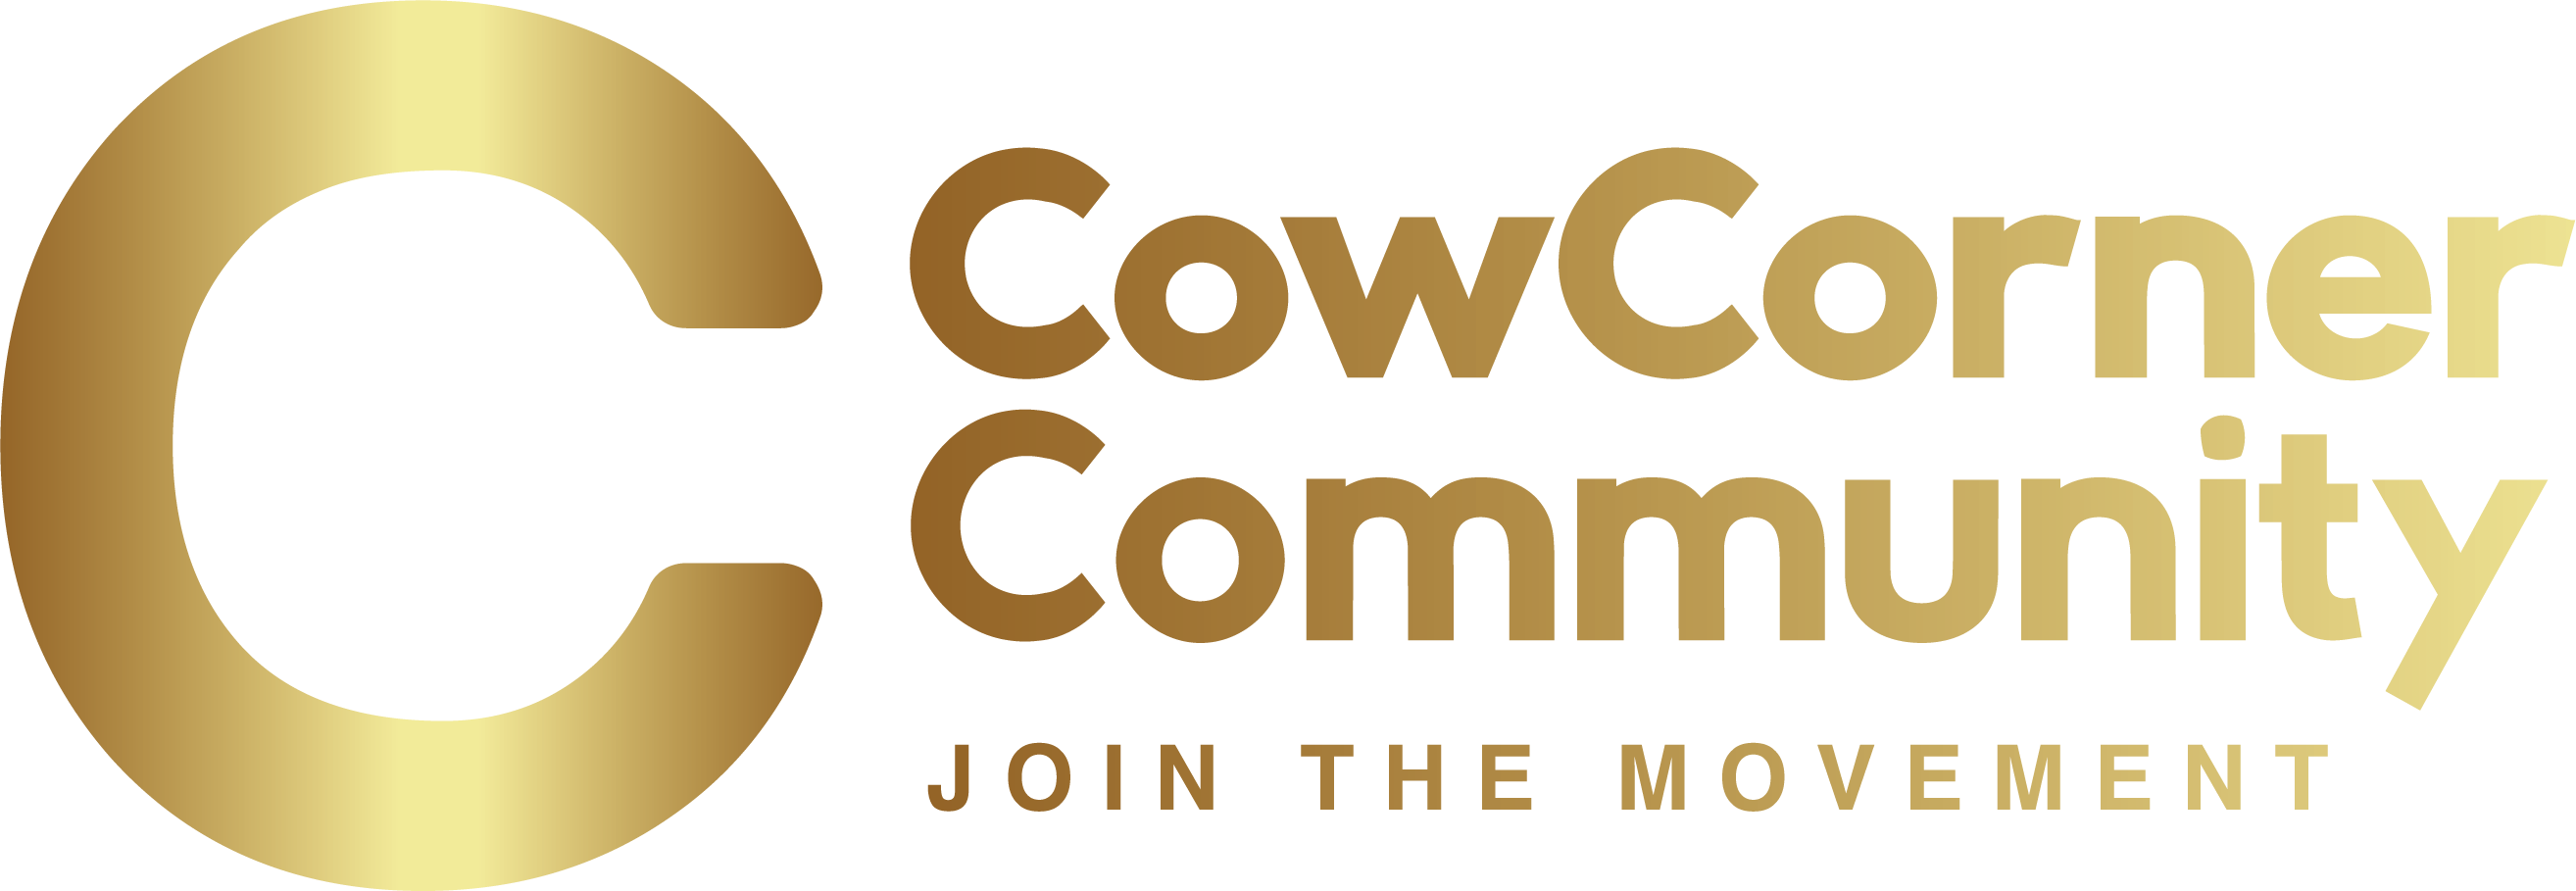 CowCorner-Community-logoW